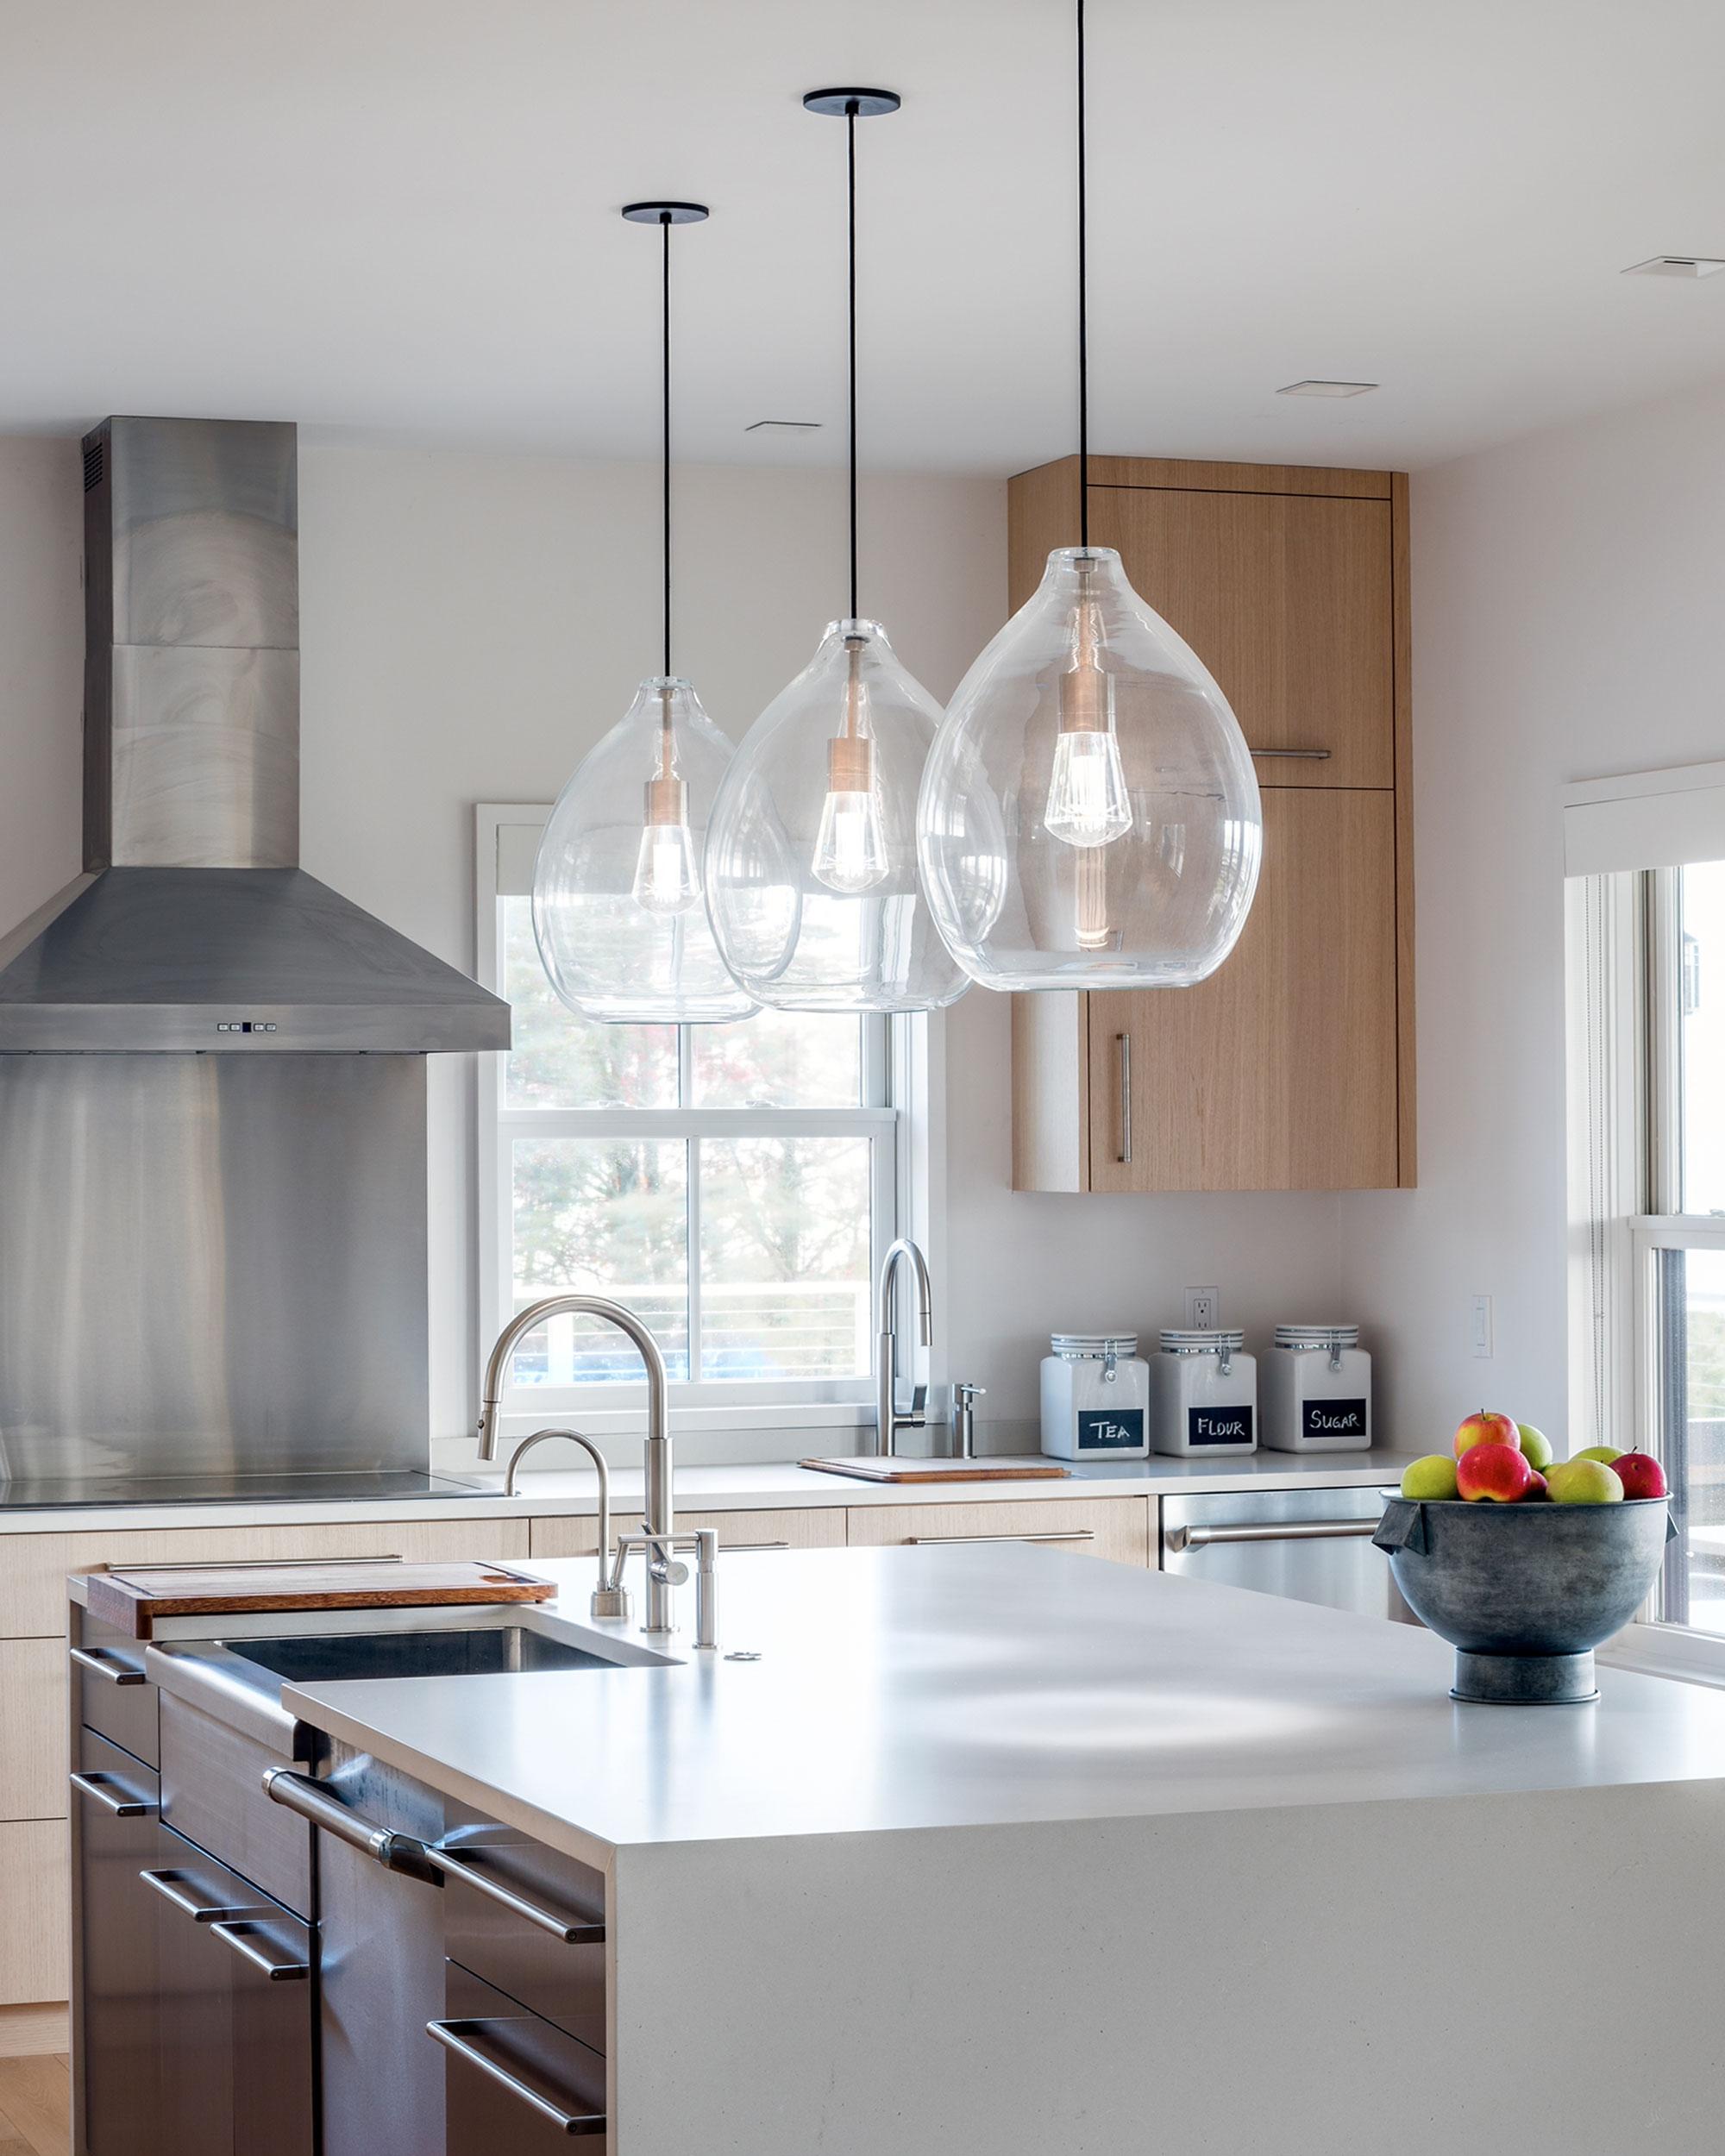 100 kitchen track lighting to raise planning my design42